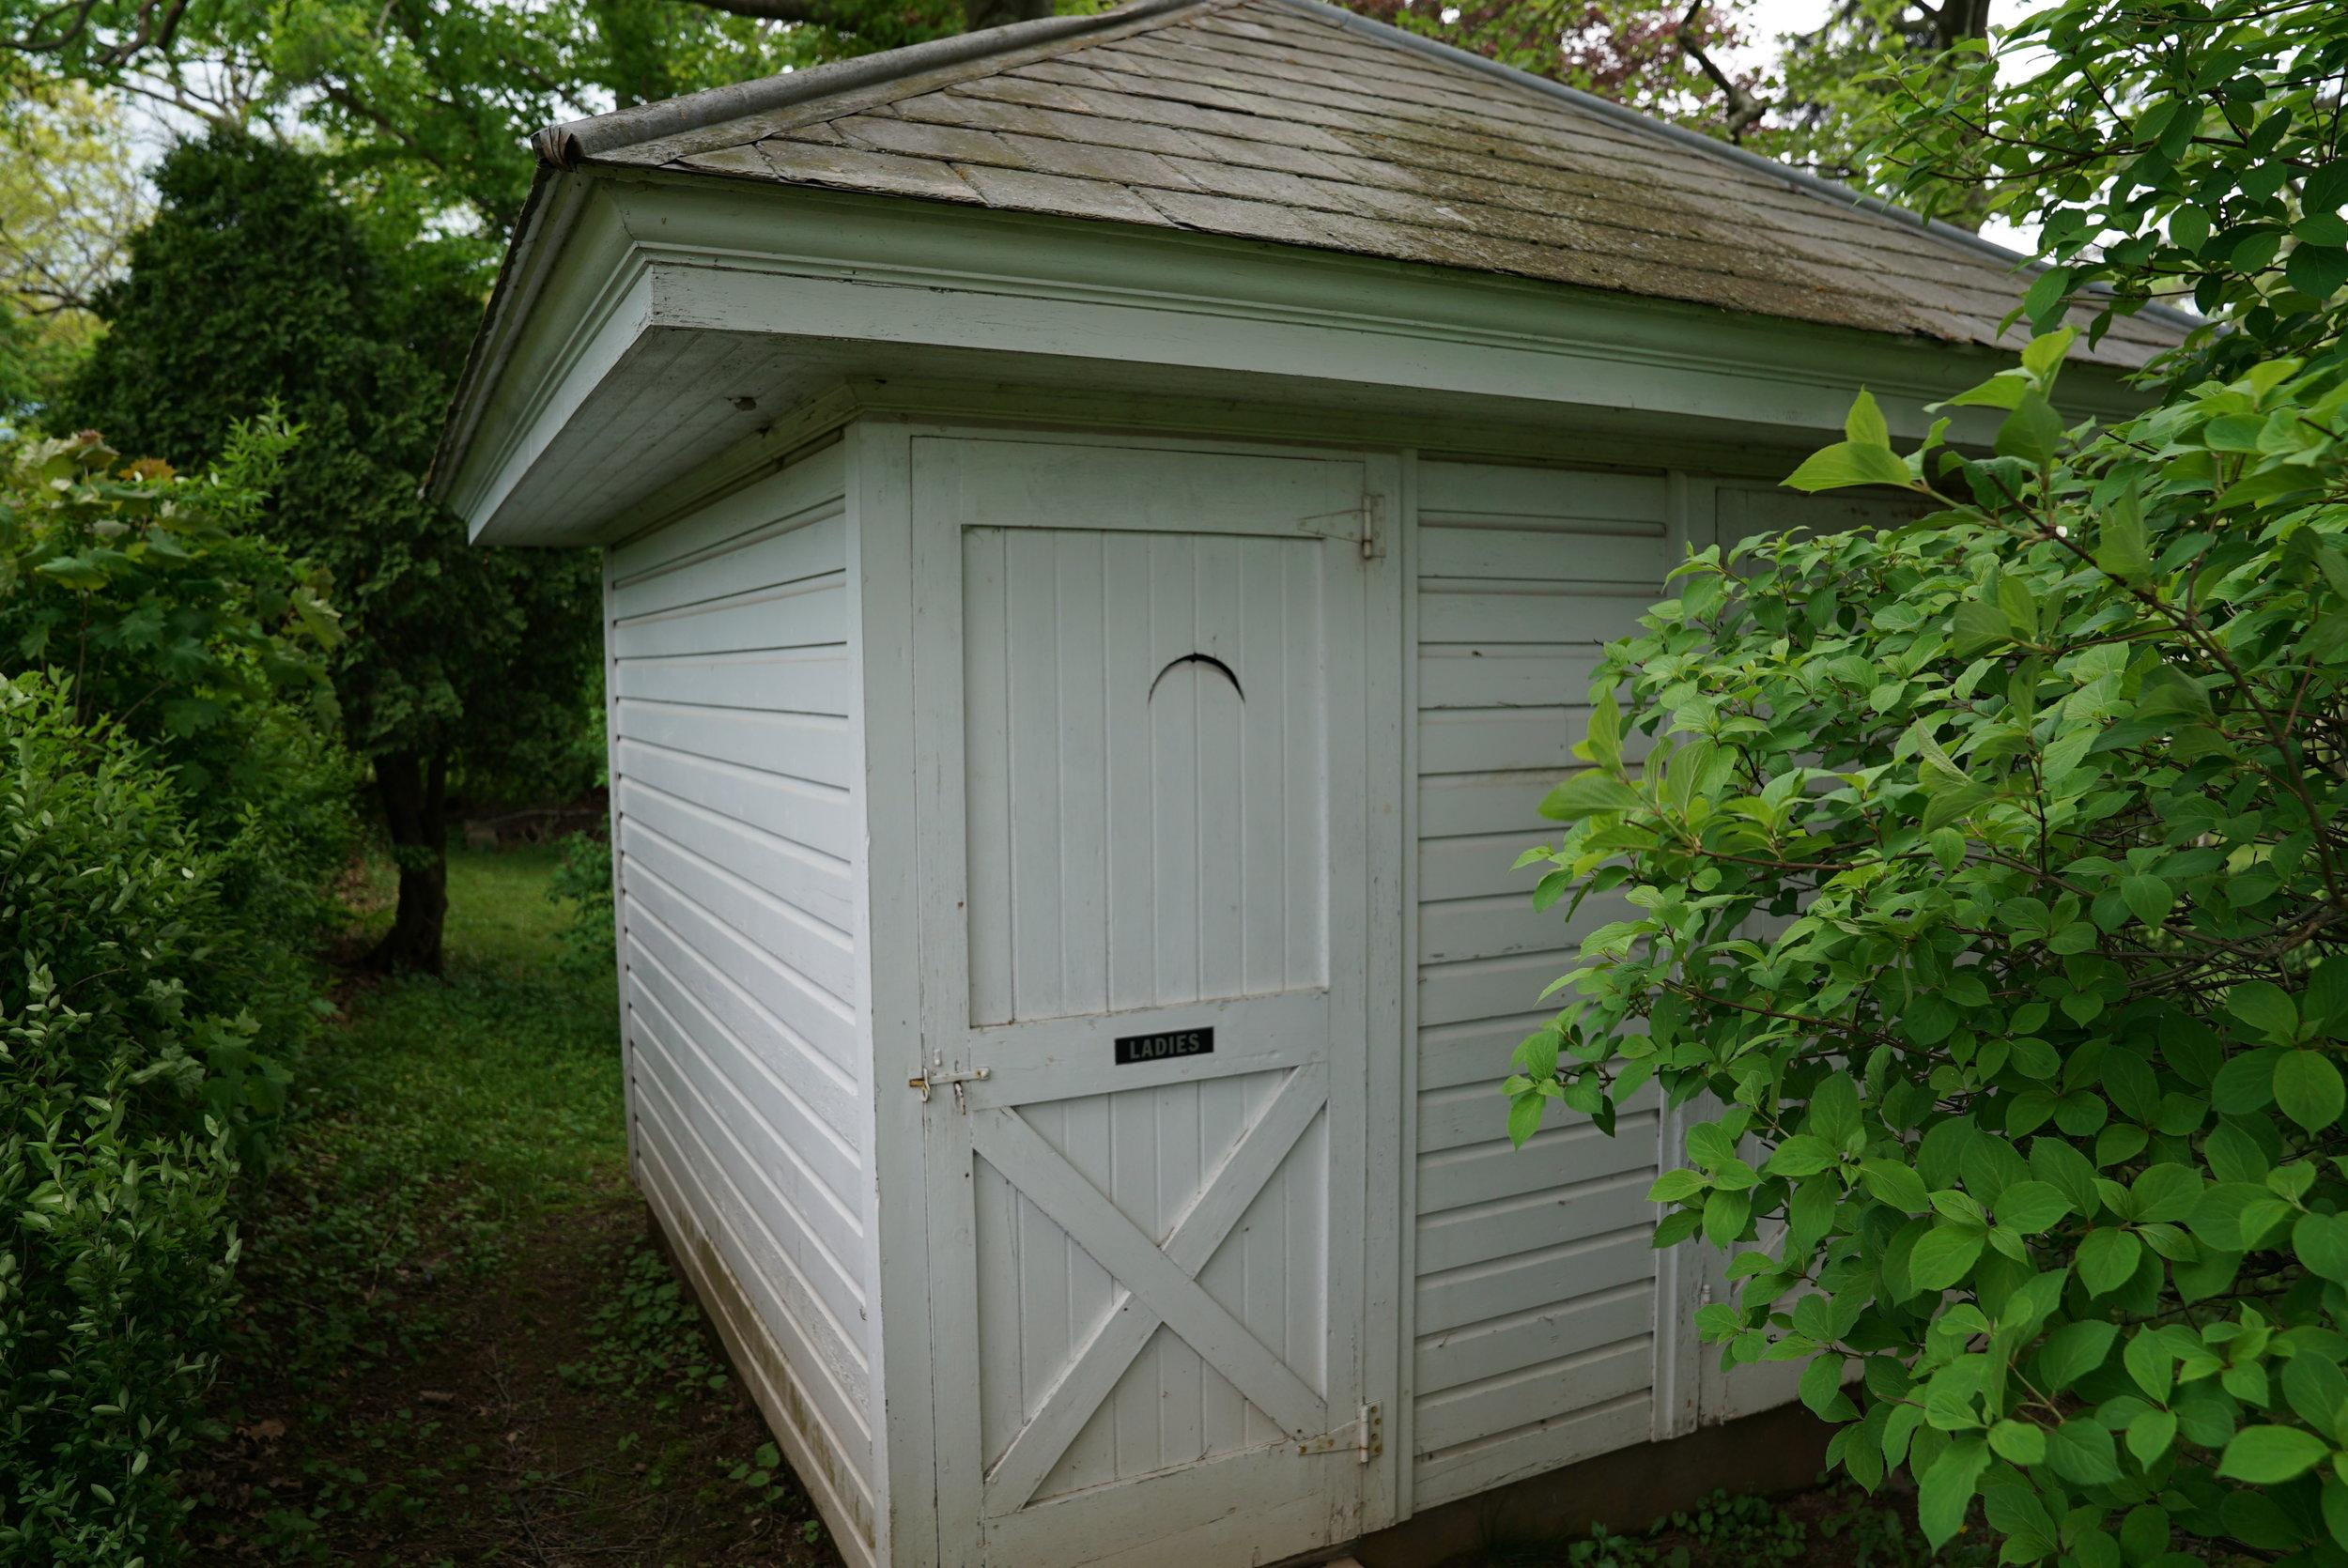 Outdoor restrooms. Hosensack Meeting House and Cemetery. Upper Hanover Township, Pennsylvania.